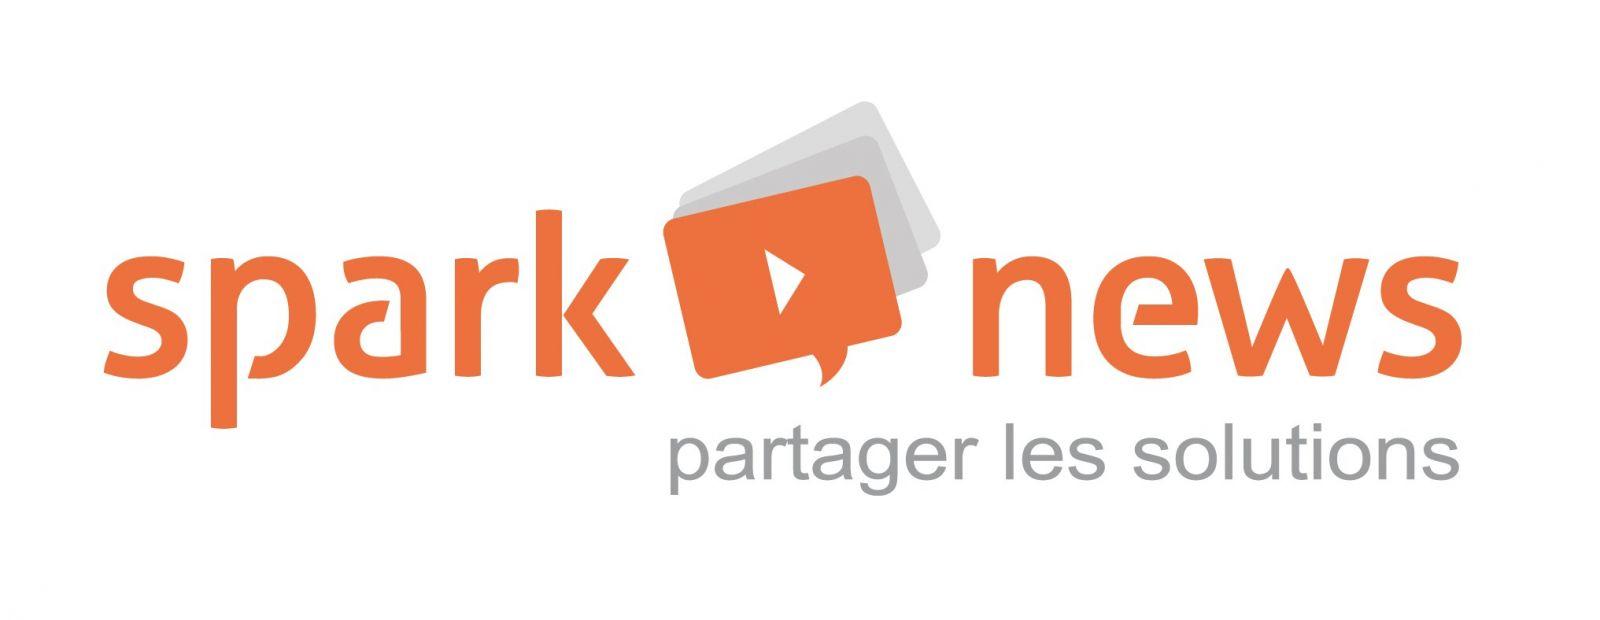 Investir & +_sparknews logo